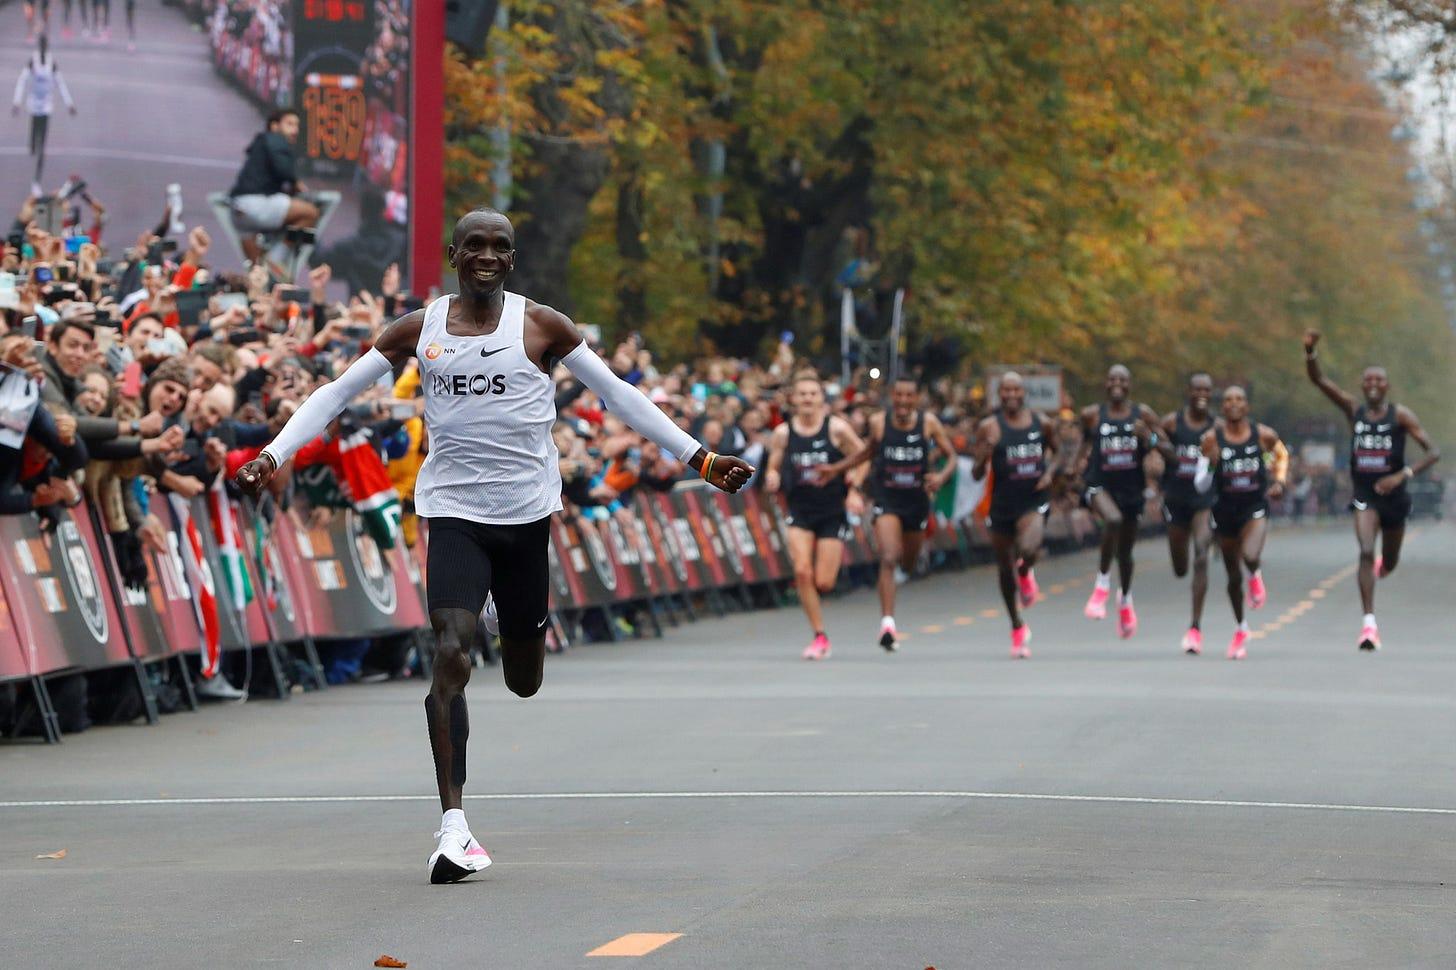 Eliud Kipchoge Breaks Two-Hour Marathon Barrier - The New York Times